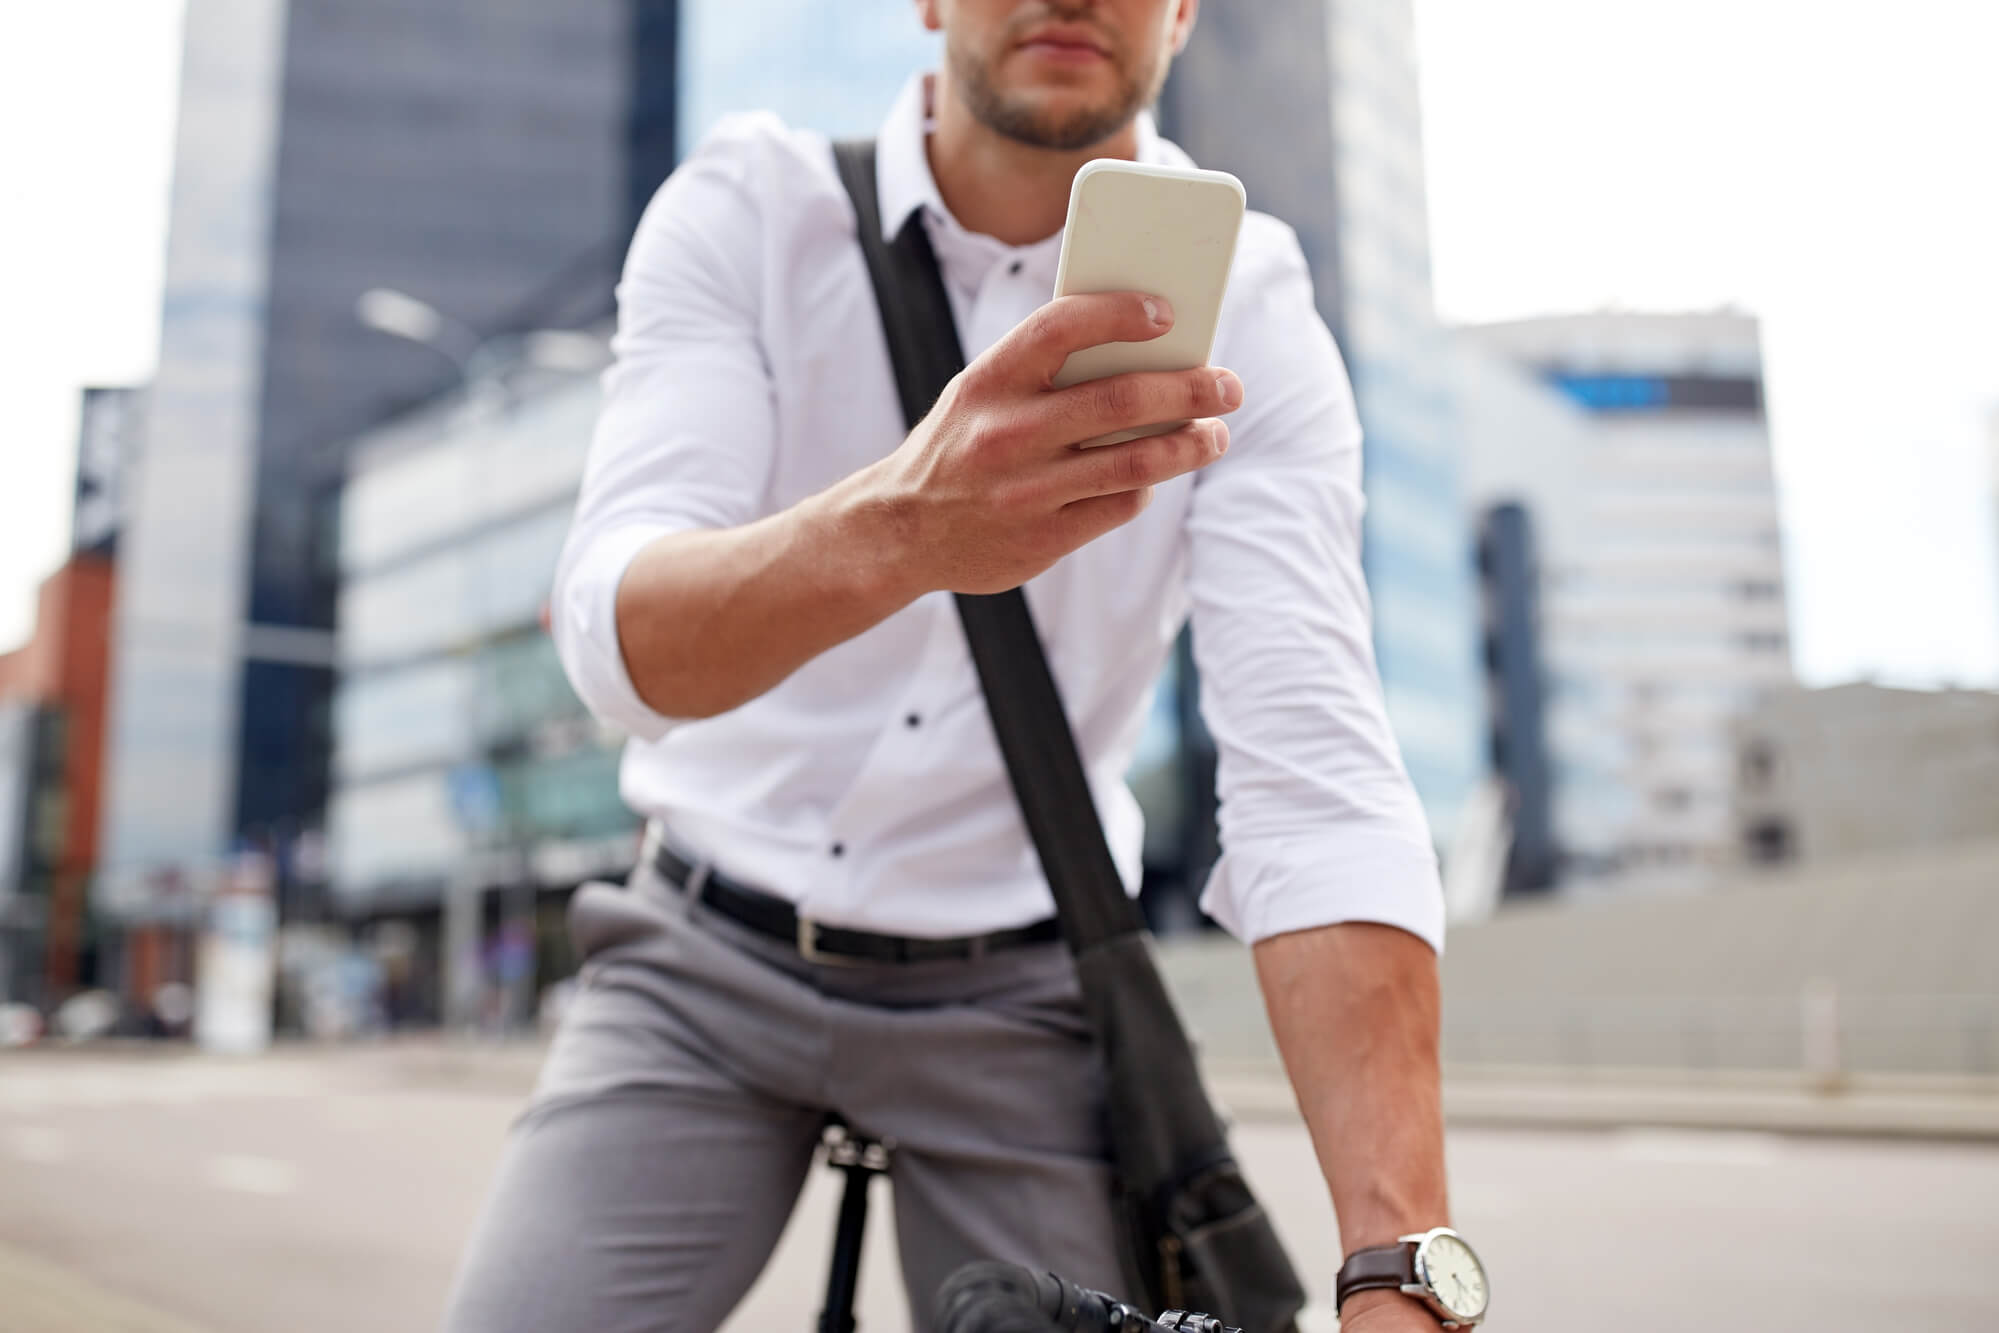 5 desafios de desenvolver aplicativos para planos de mobilidade